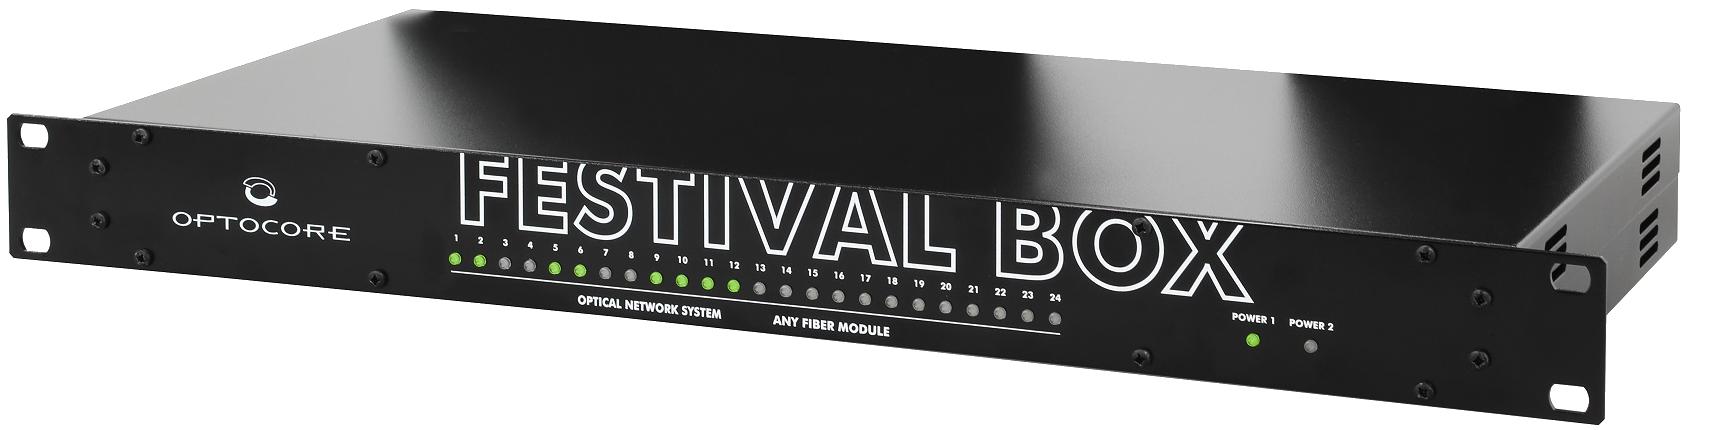 INSTANT BREAKTHROUGH FOR OPTOCORE'S REVOLUTIONARY FESTIVAL BOX